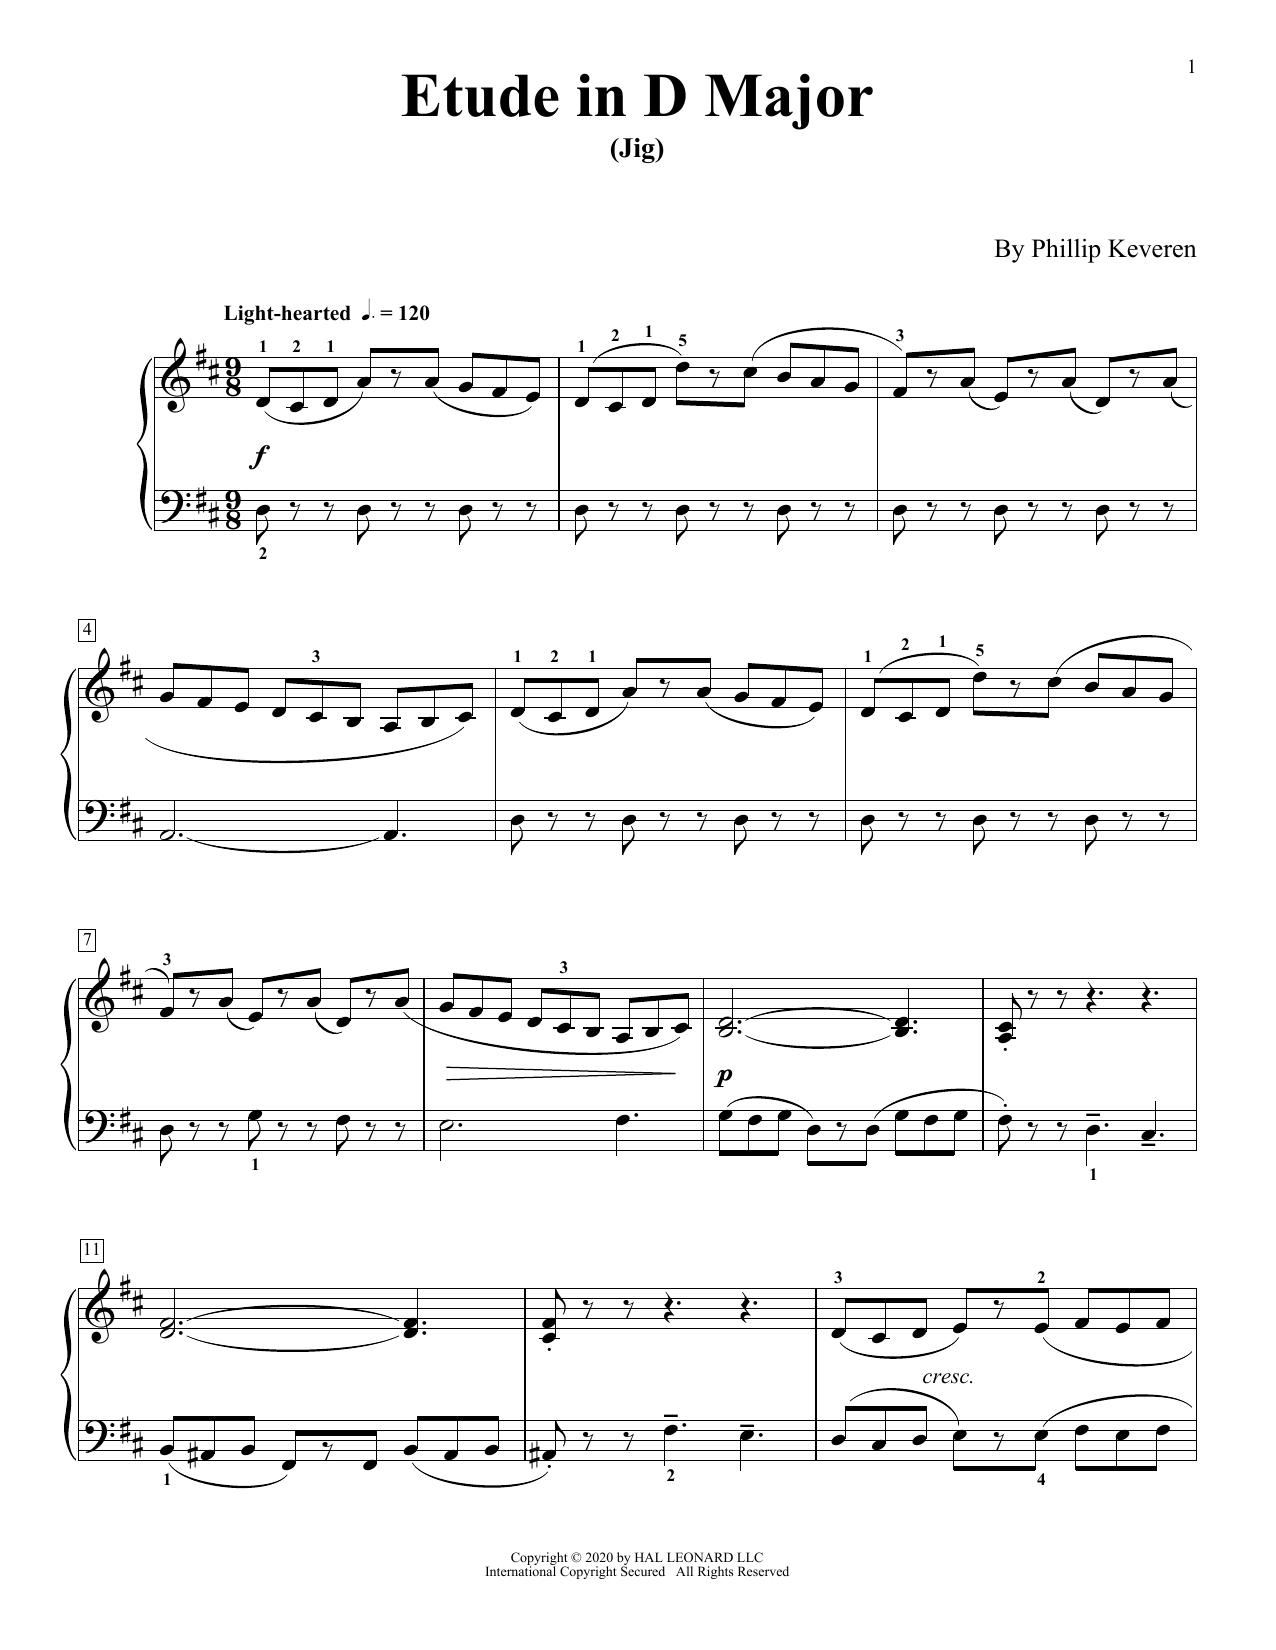 Etude In D Major (Jig) (Piano Solo)